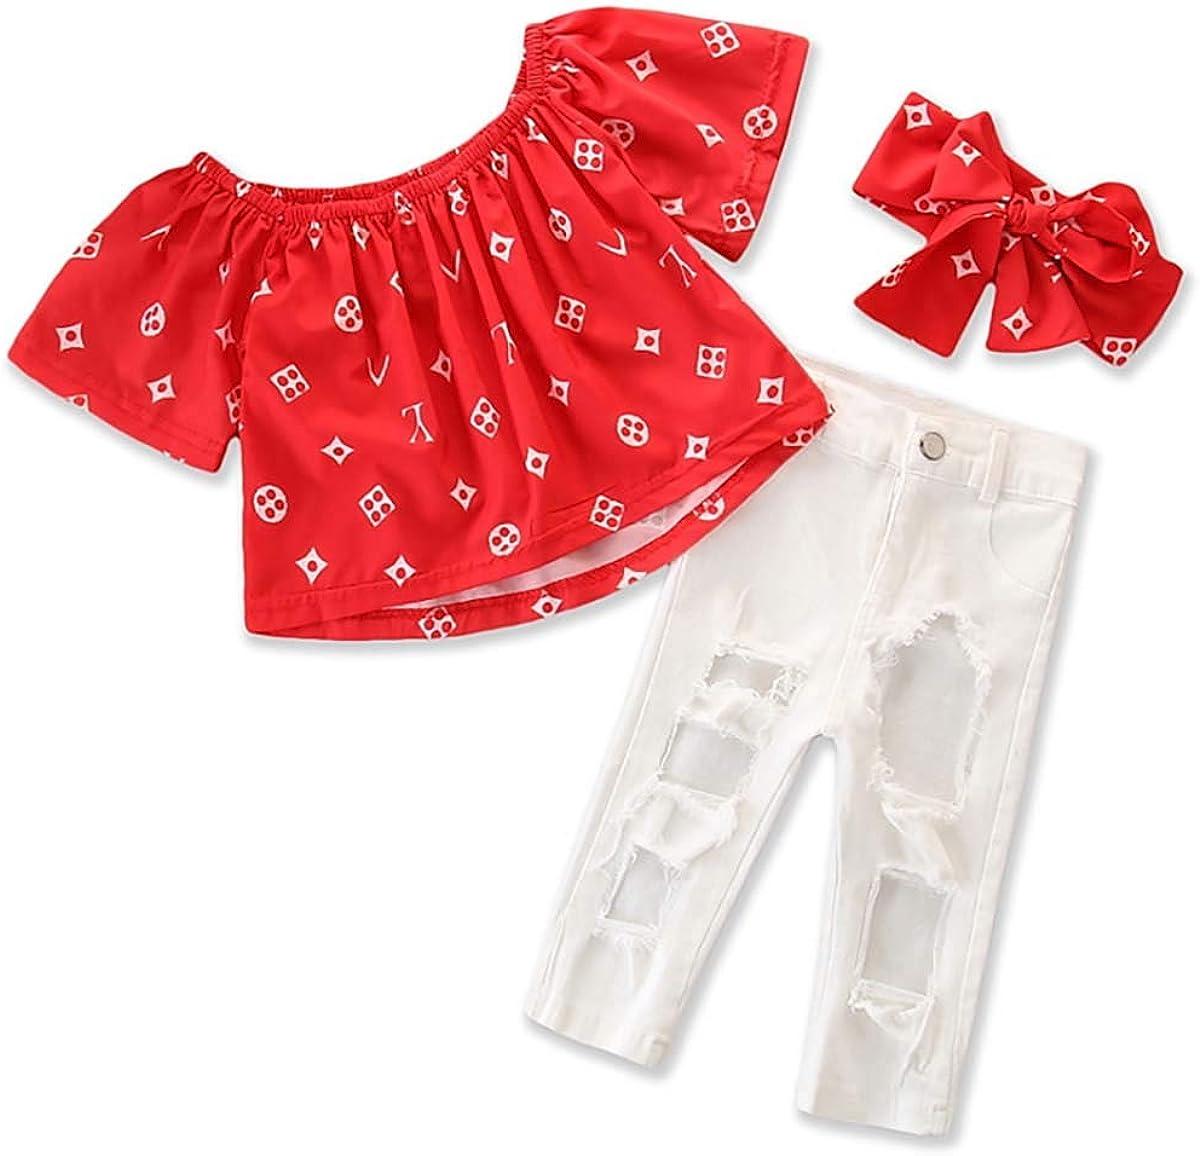 Kleinkind Kinder Baby M/ädchen Mode Druck Shirt Rot Off-Schulter Top Stirnband Outfits L/ässig T-Shirt Jeans Sommer Kleidung 3Pcs Sets Wei/ße Jeans Zerrissene Hose